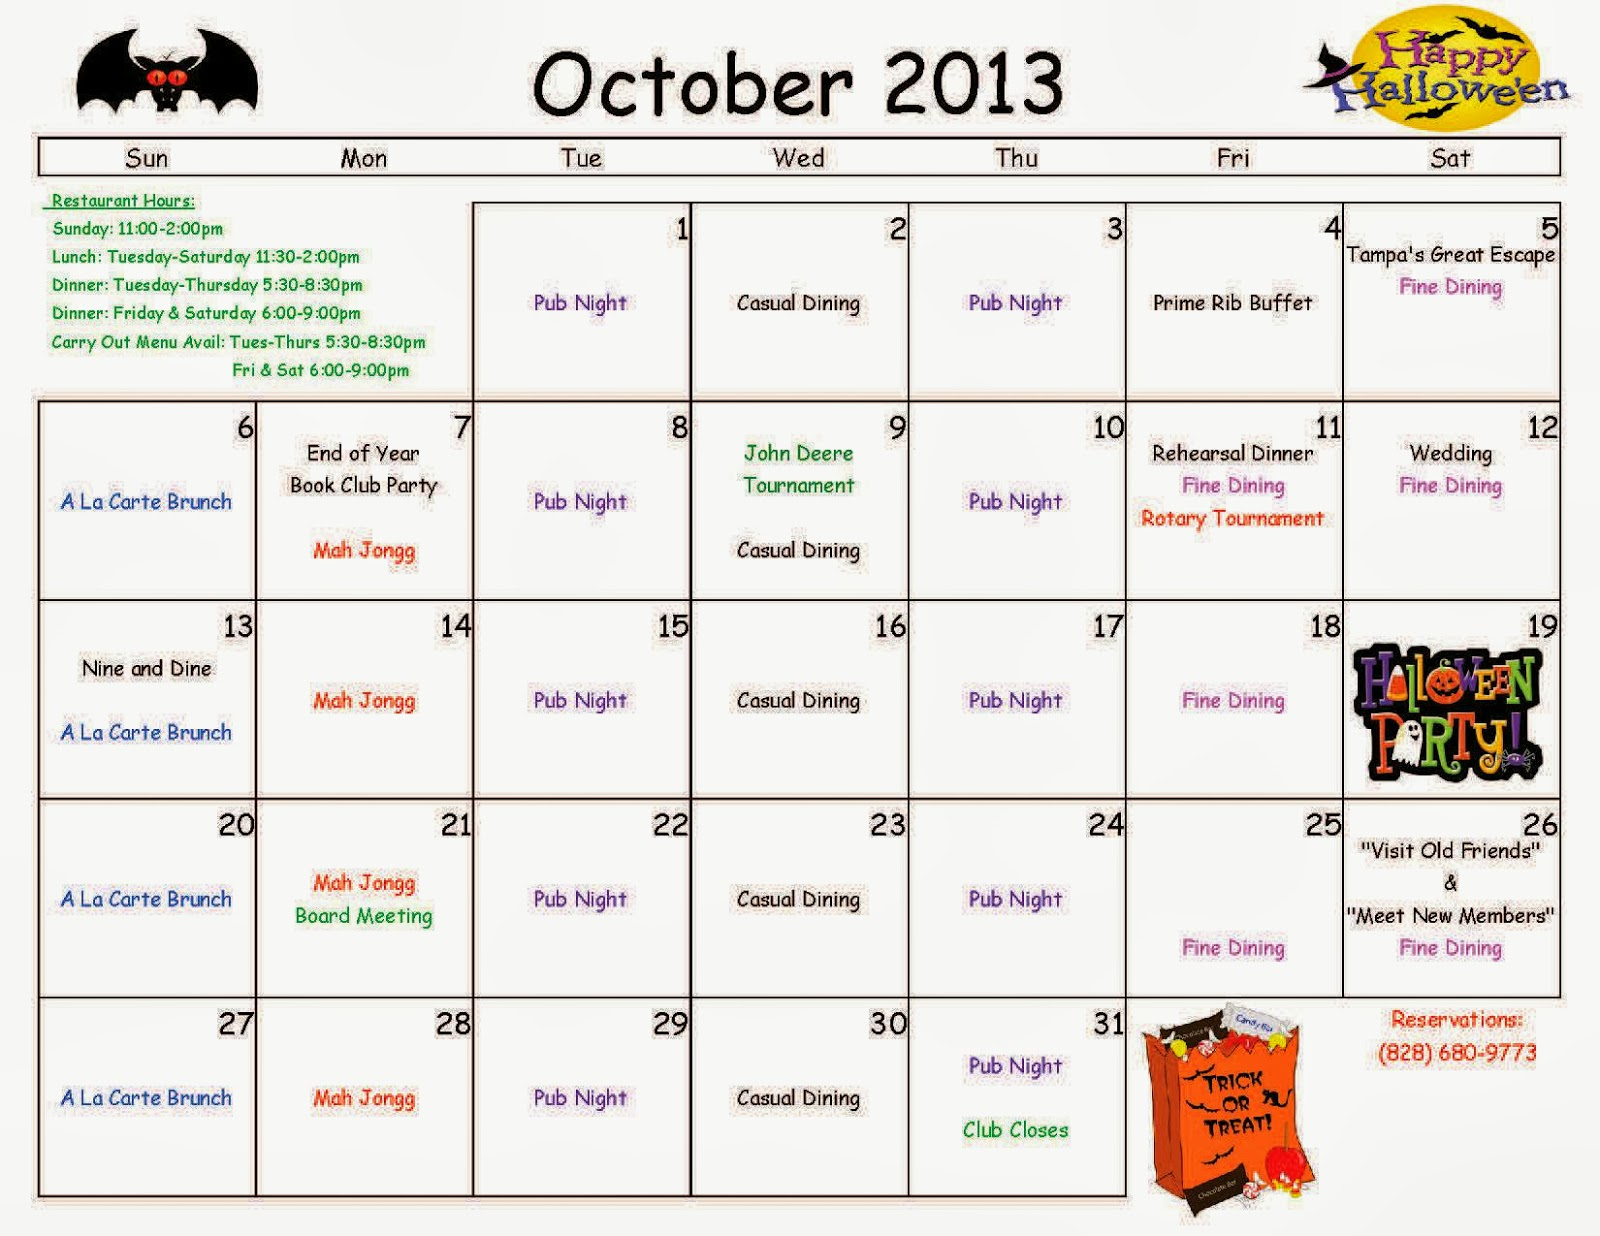 Wolf Laurel Country Club Bulletin Board: Calendar - October 2013